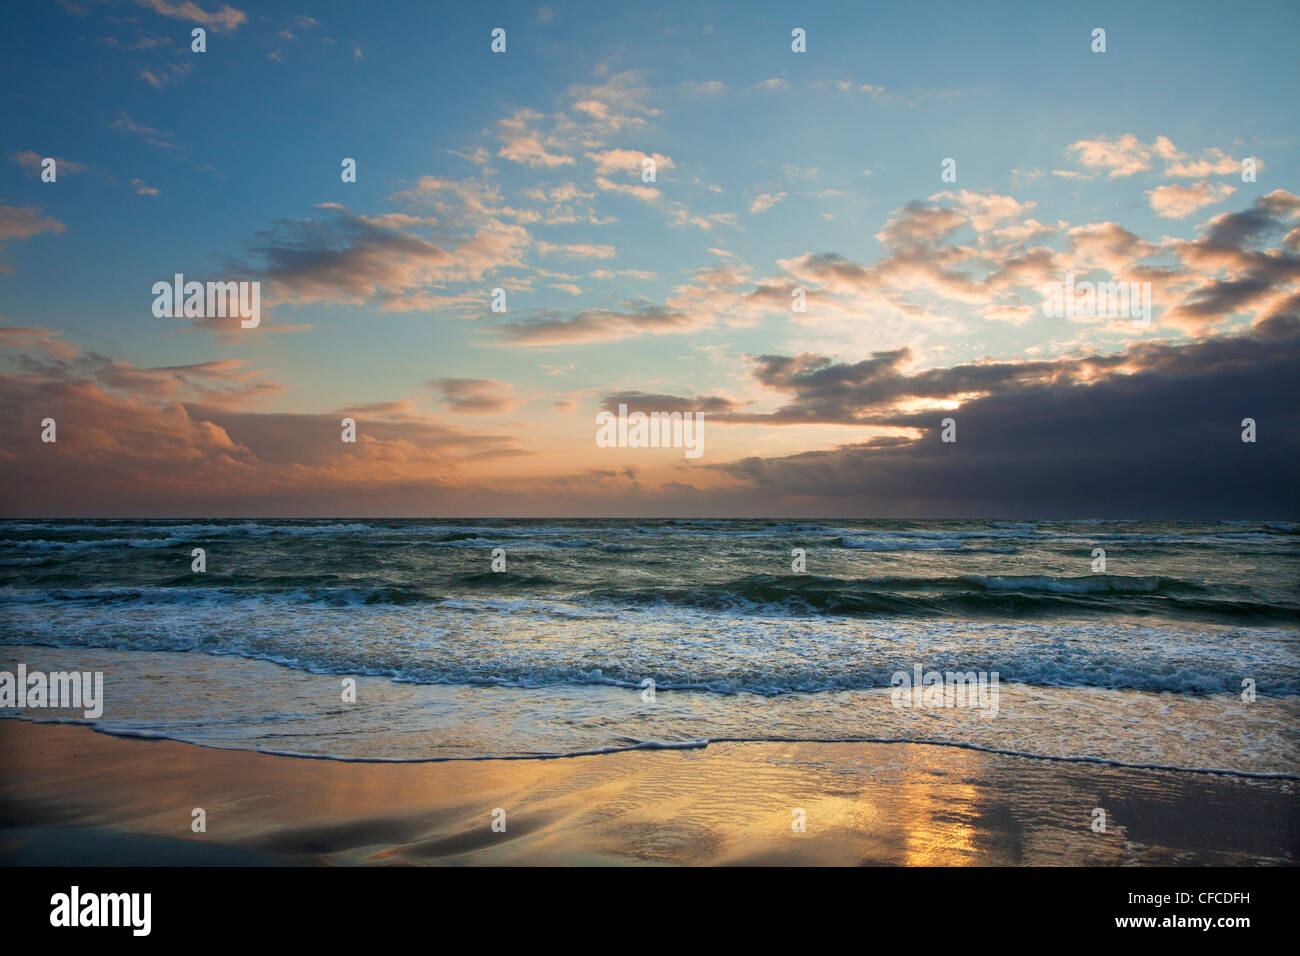 Darss West beach at dusk, Fischland-Darss-Zingst, Baltic Sea, Mecklenburg-West Pomerania, Germany Stock Photo